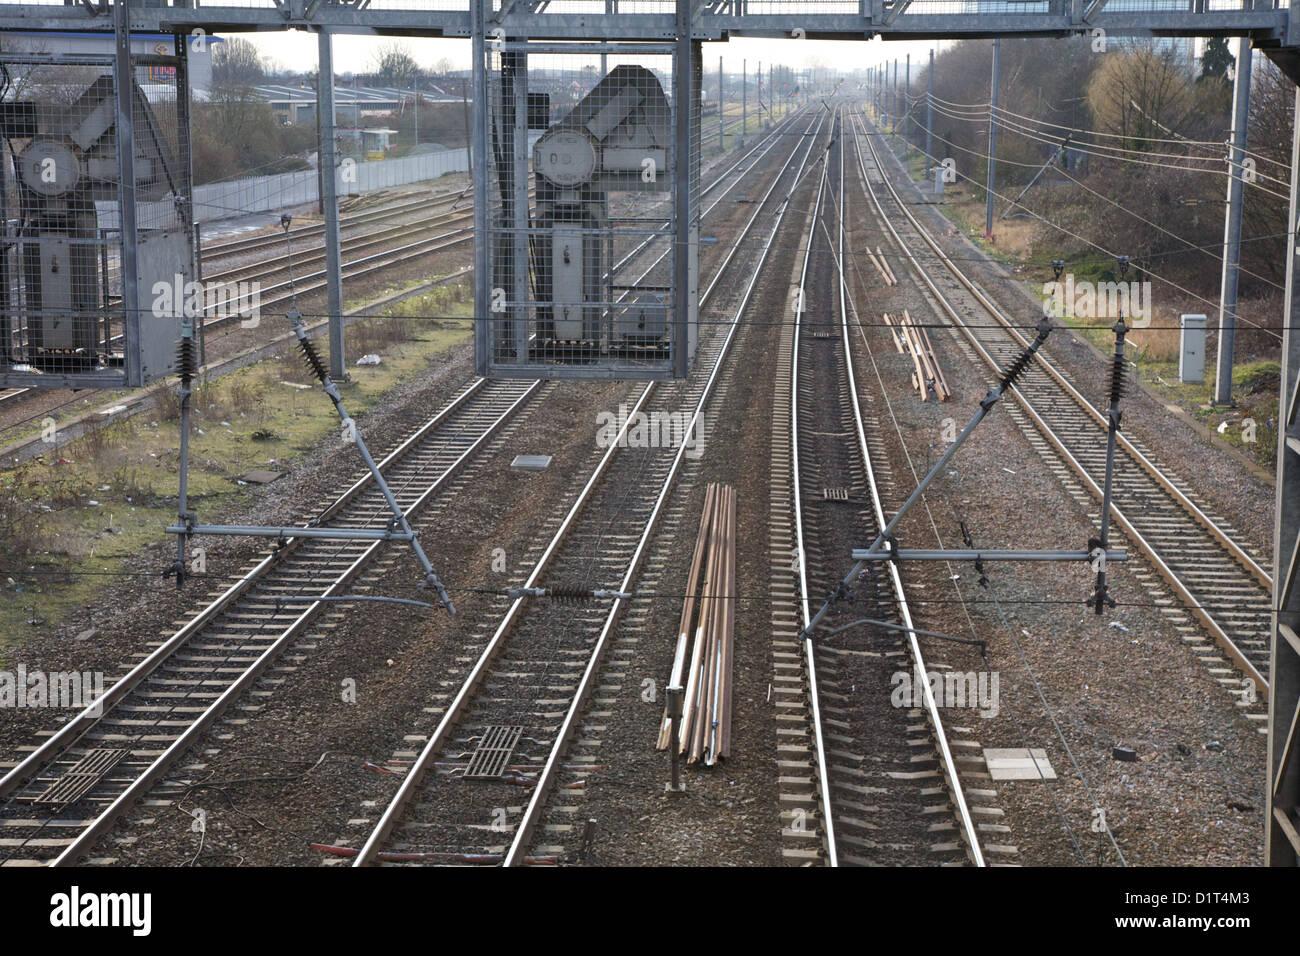 railway lines at Willesden Junction, London, UK, Europe, EU. - Stock Image